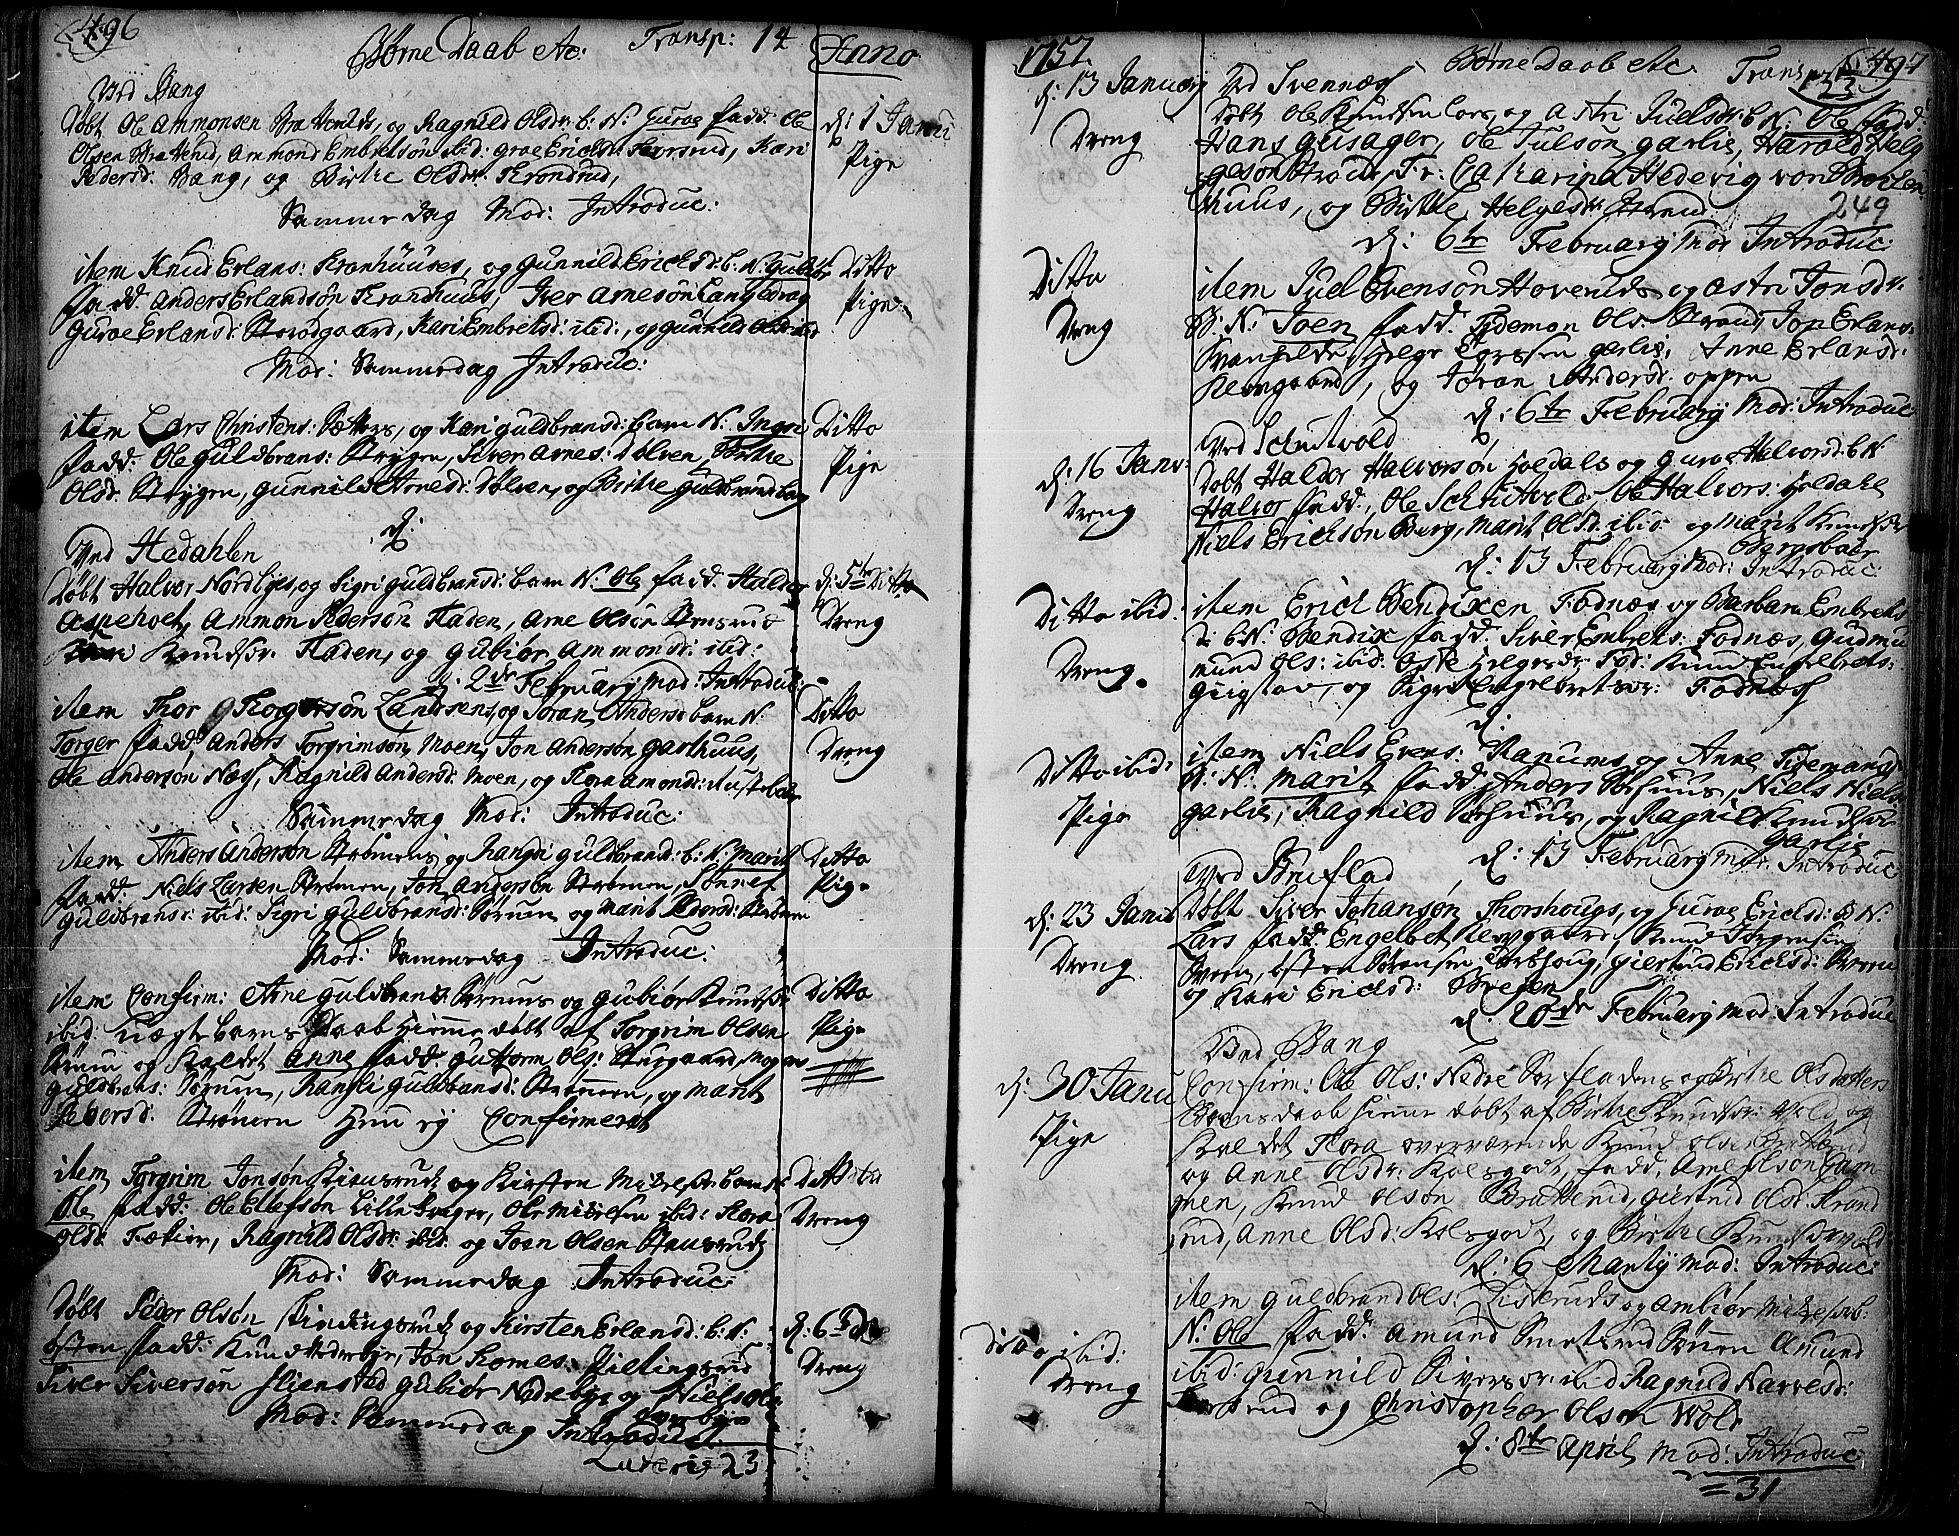 SAH, Aurdal prestekontor, Ministerialbok nr. 4, 1730-1762, s. 496-497